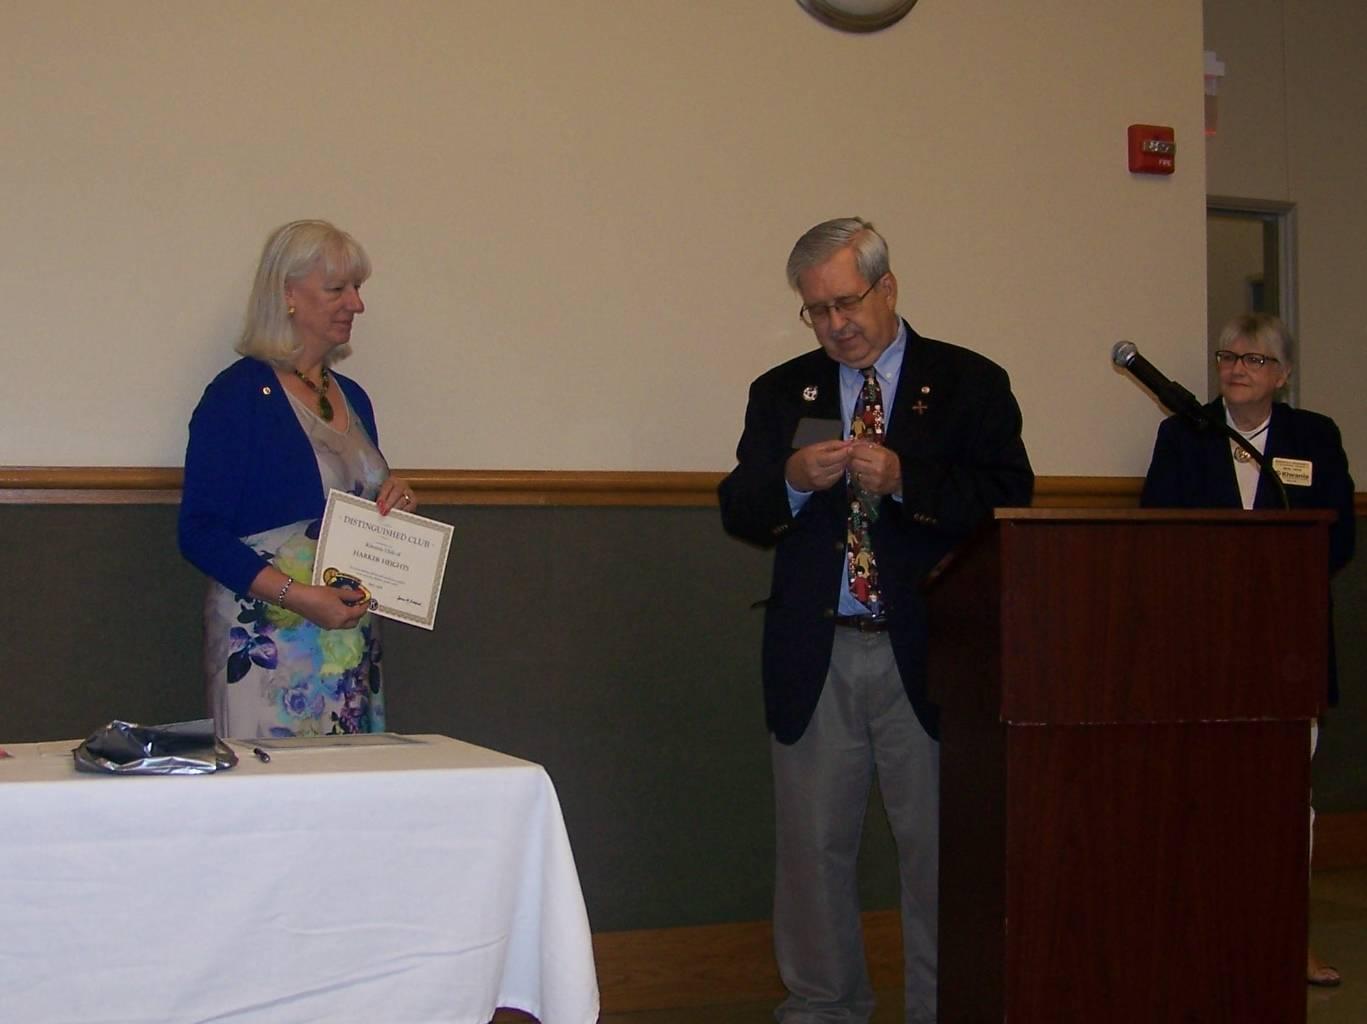 2017-2018 Distinguished Kiwanis Club Award